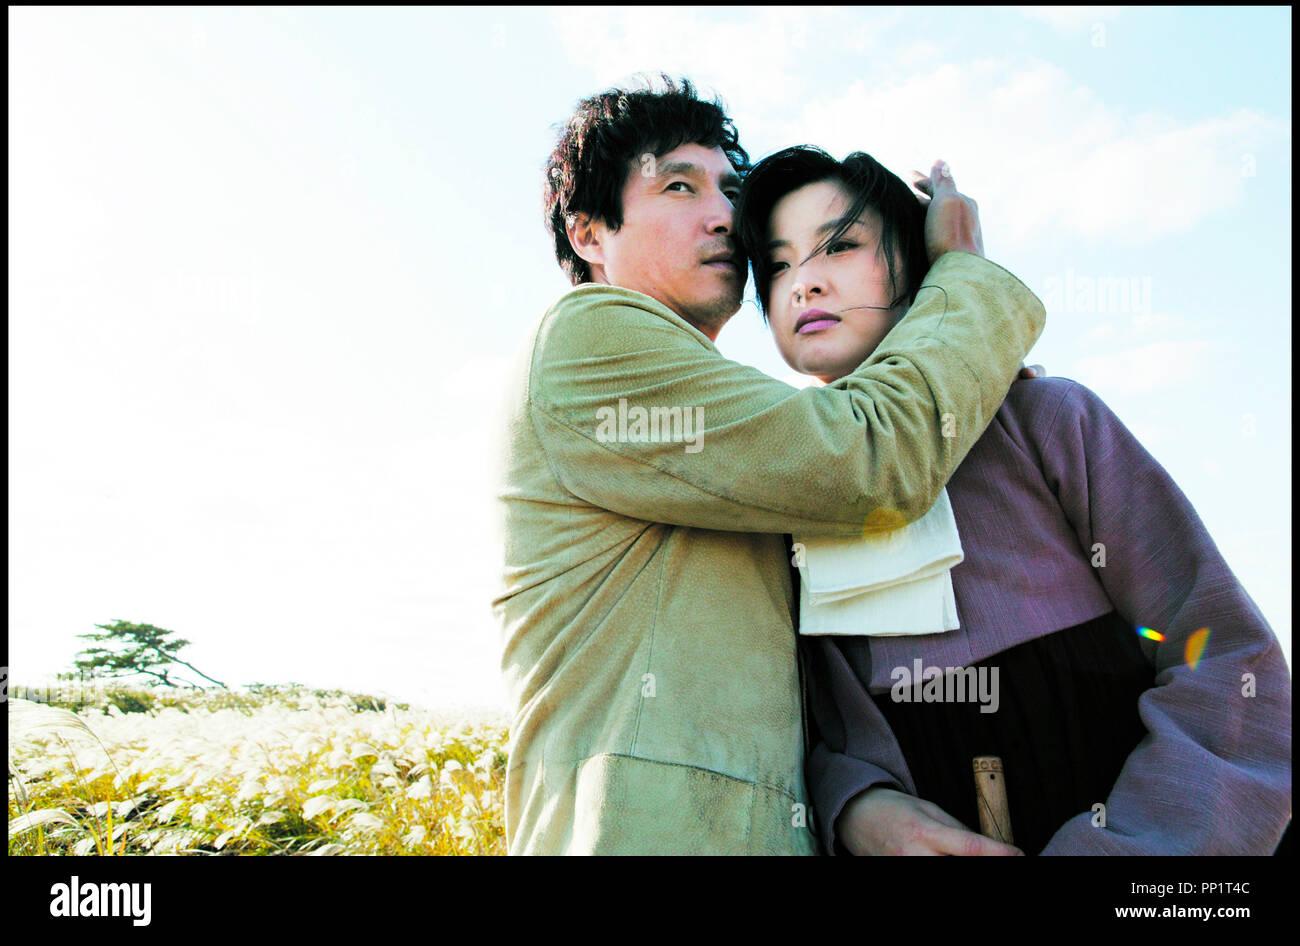 Jae Hyeon Stock Photos & Jae Hyeon Stock Images - Alamy